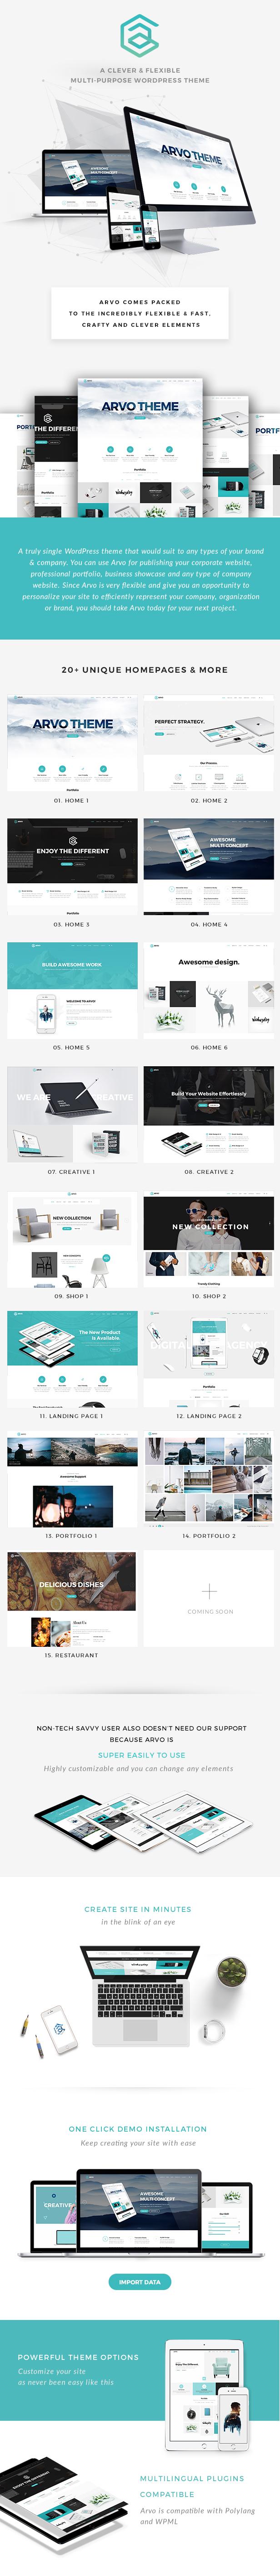 Arvo - A Clever & Flexible Multipurpose WordPress Theme - 10